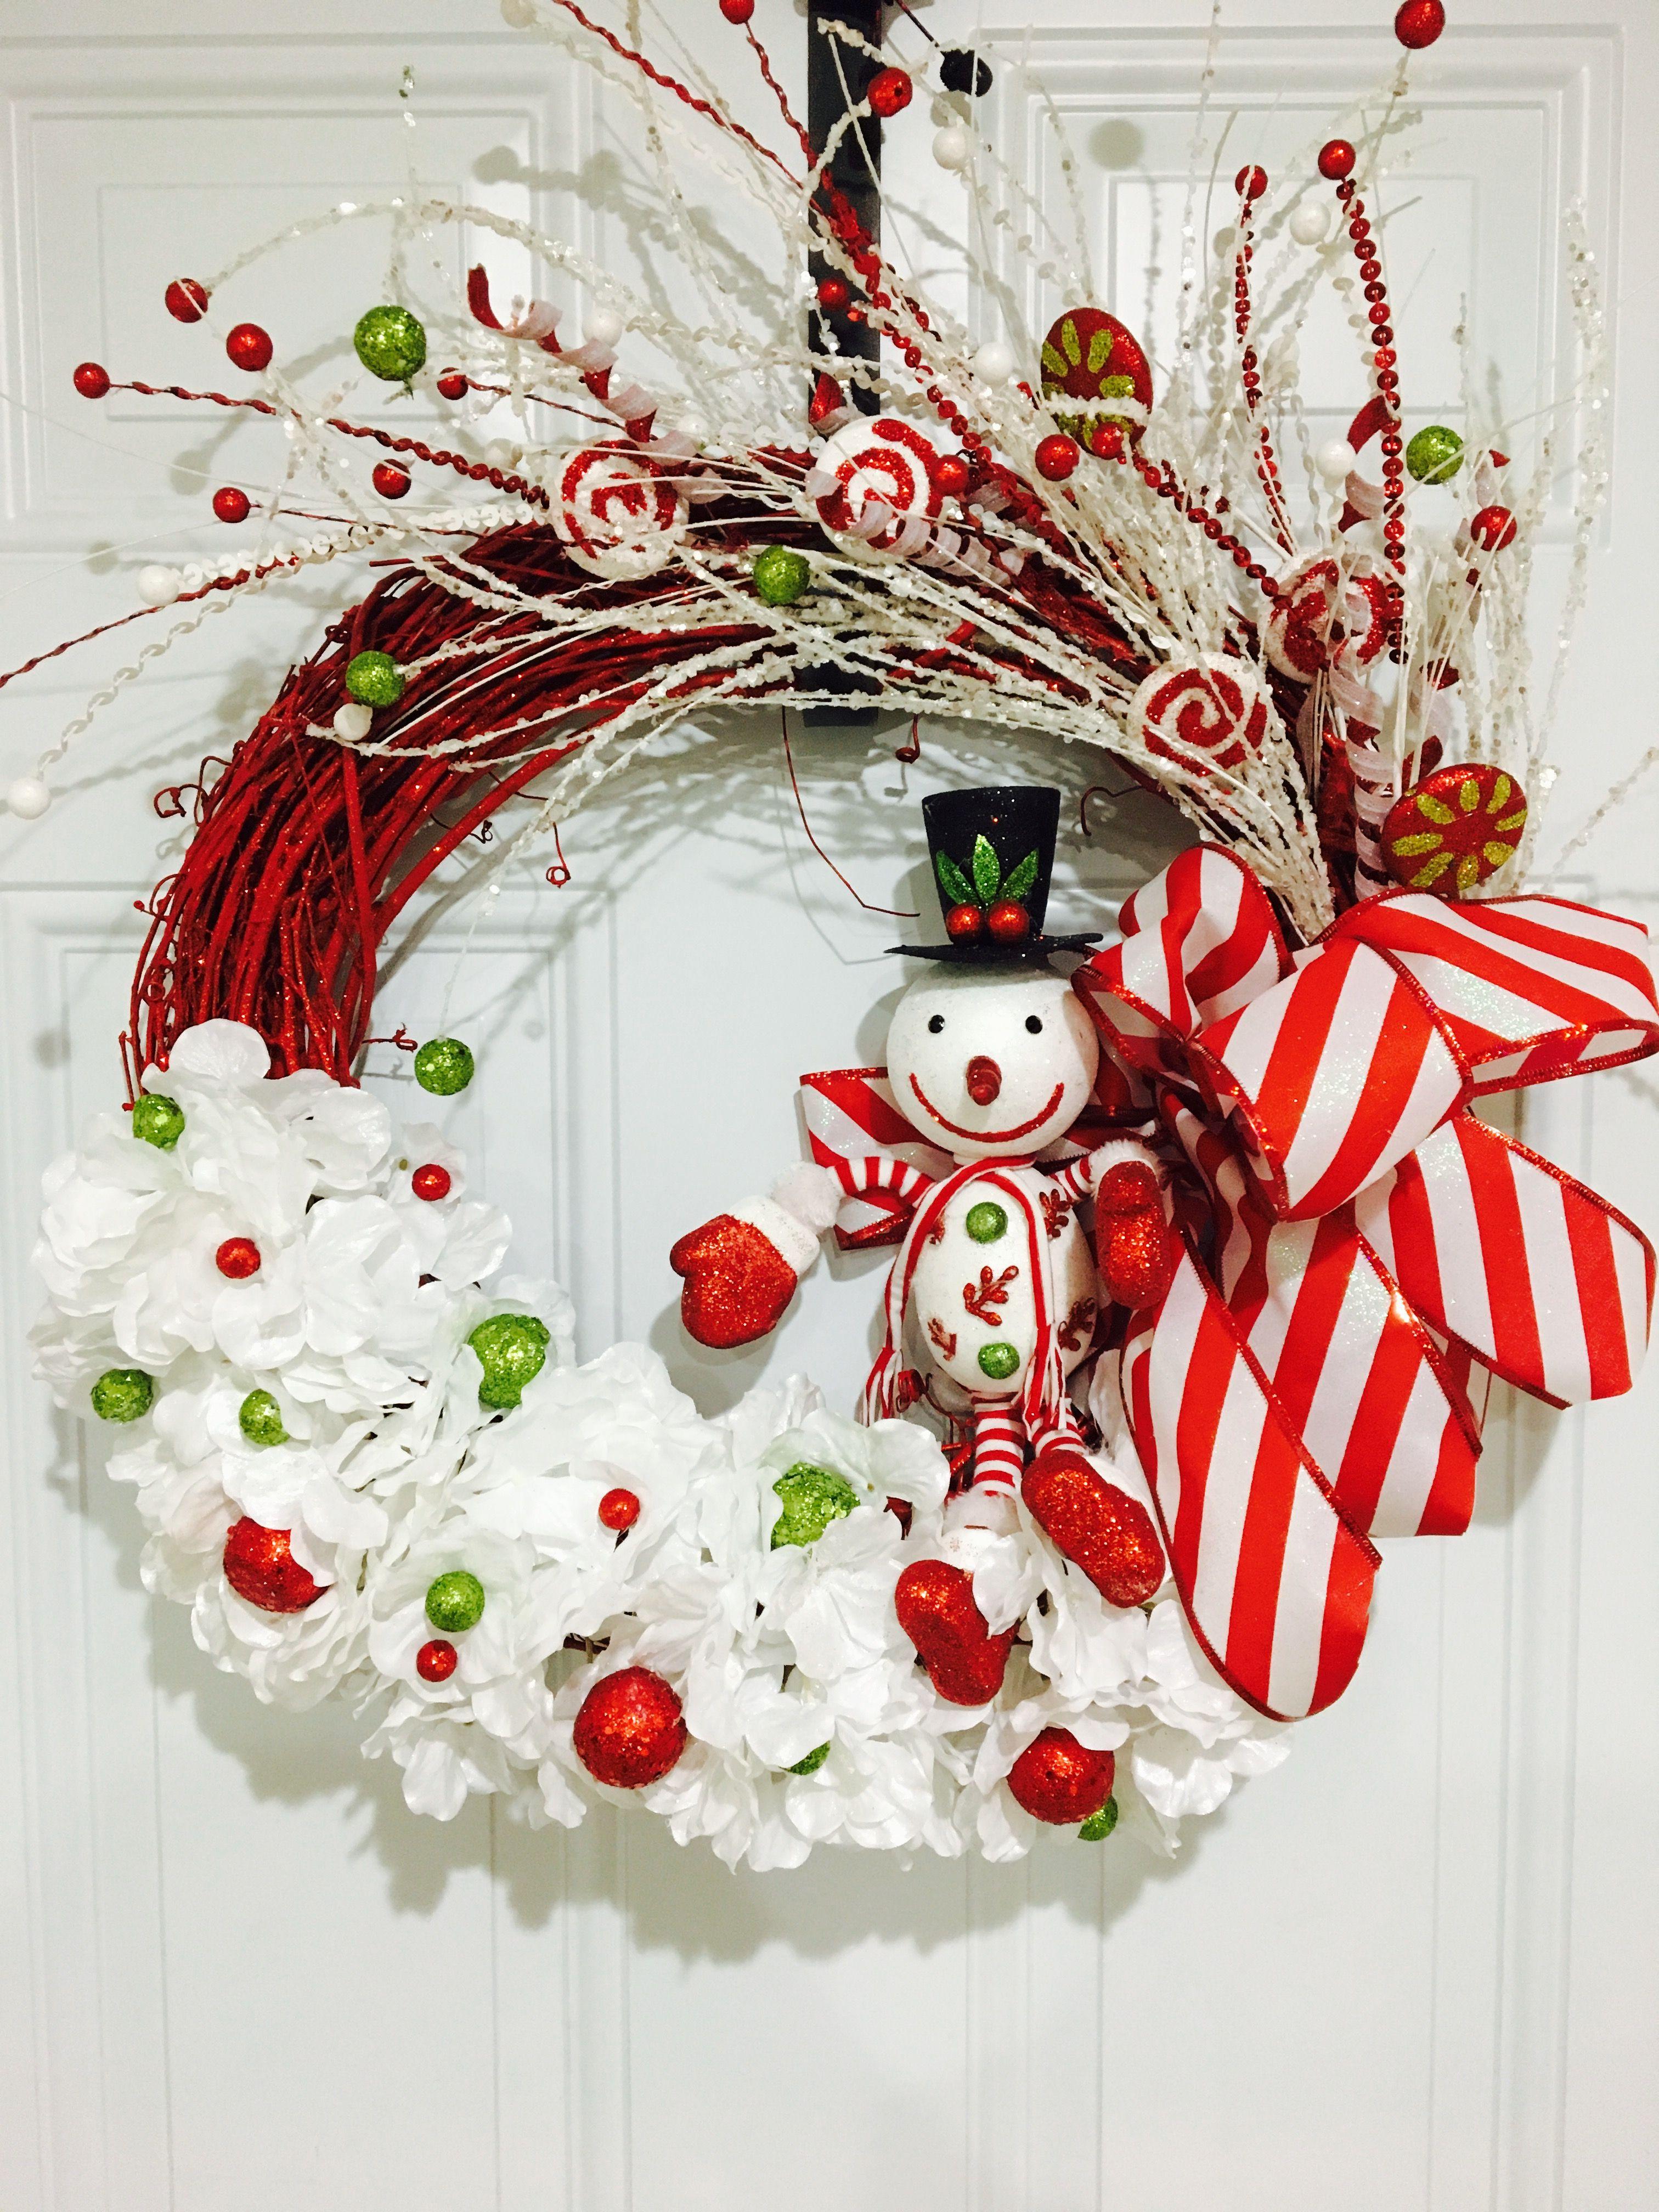 Pin de karen en navidad pinterest - Guirnaldas de navidad ...